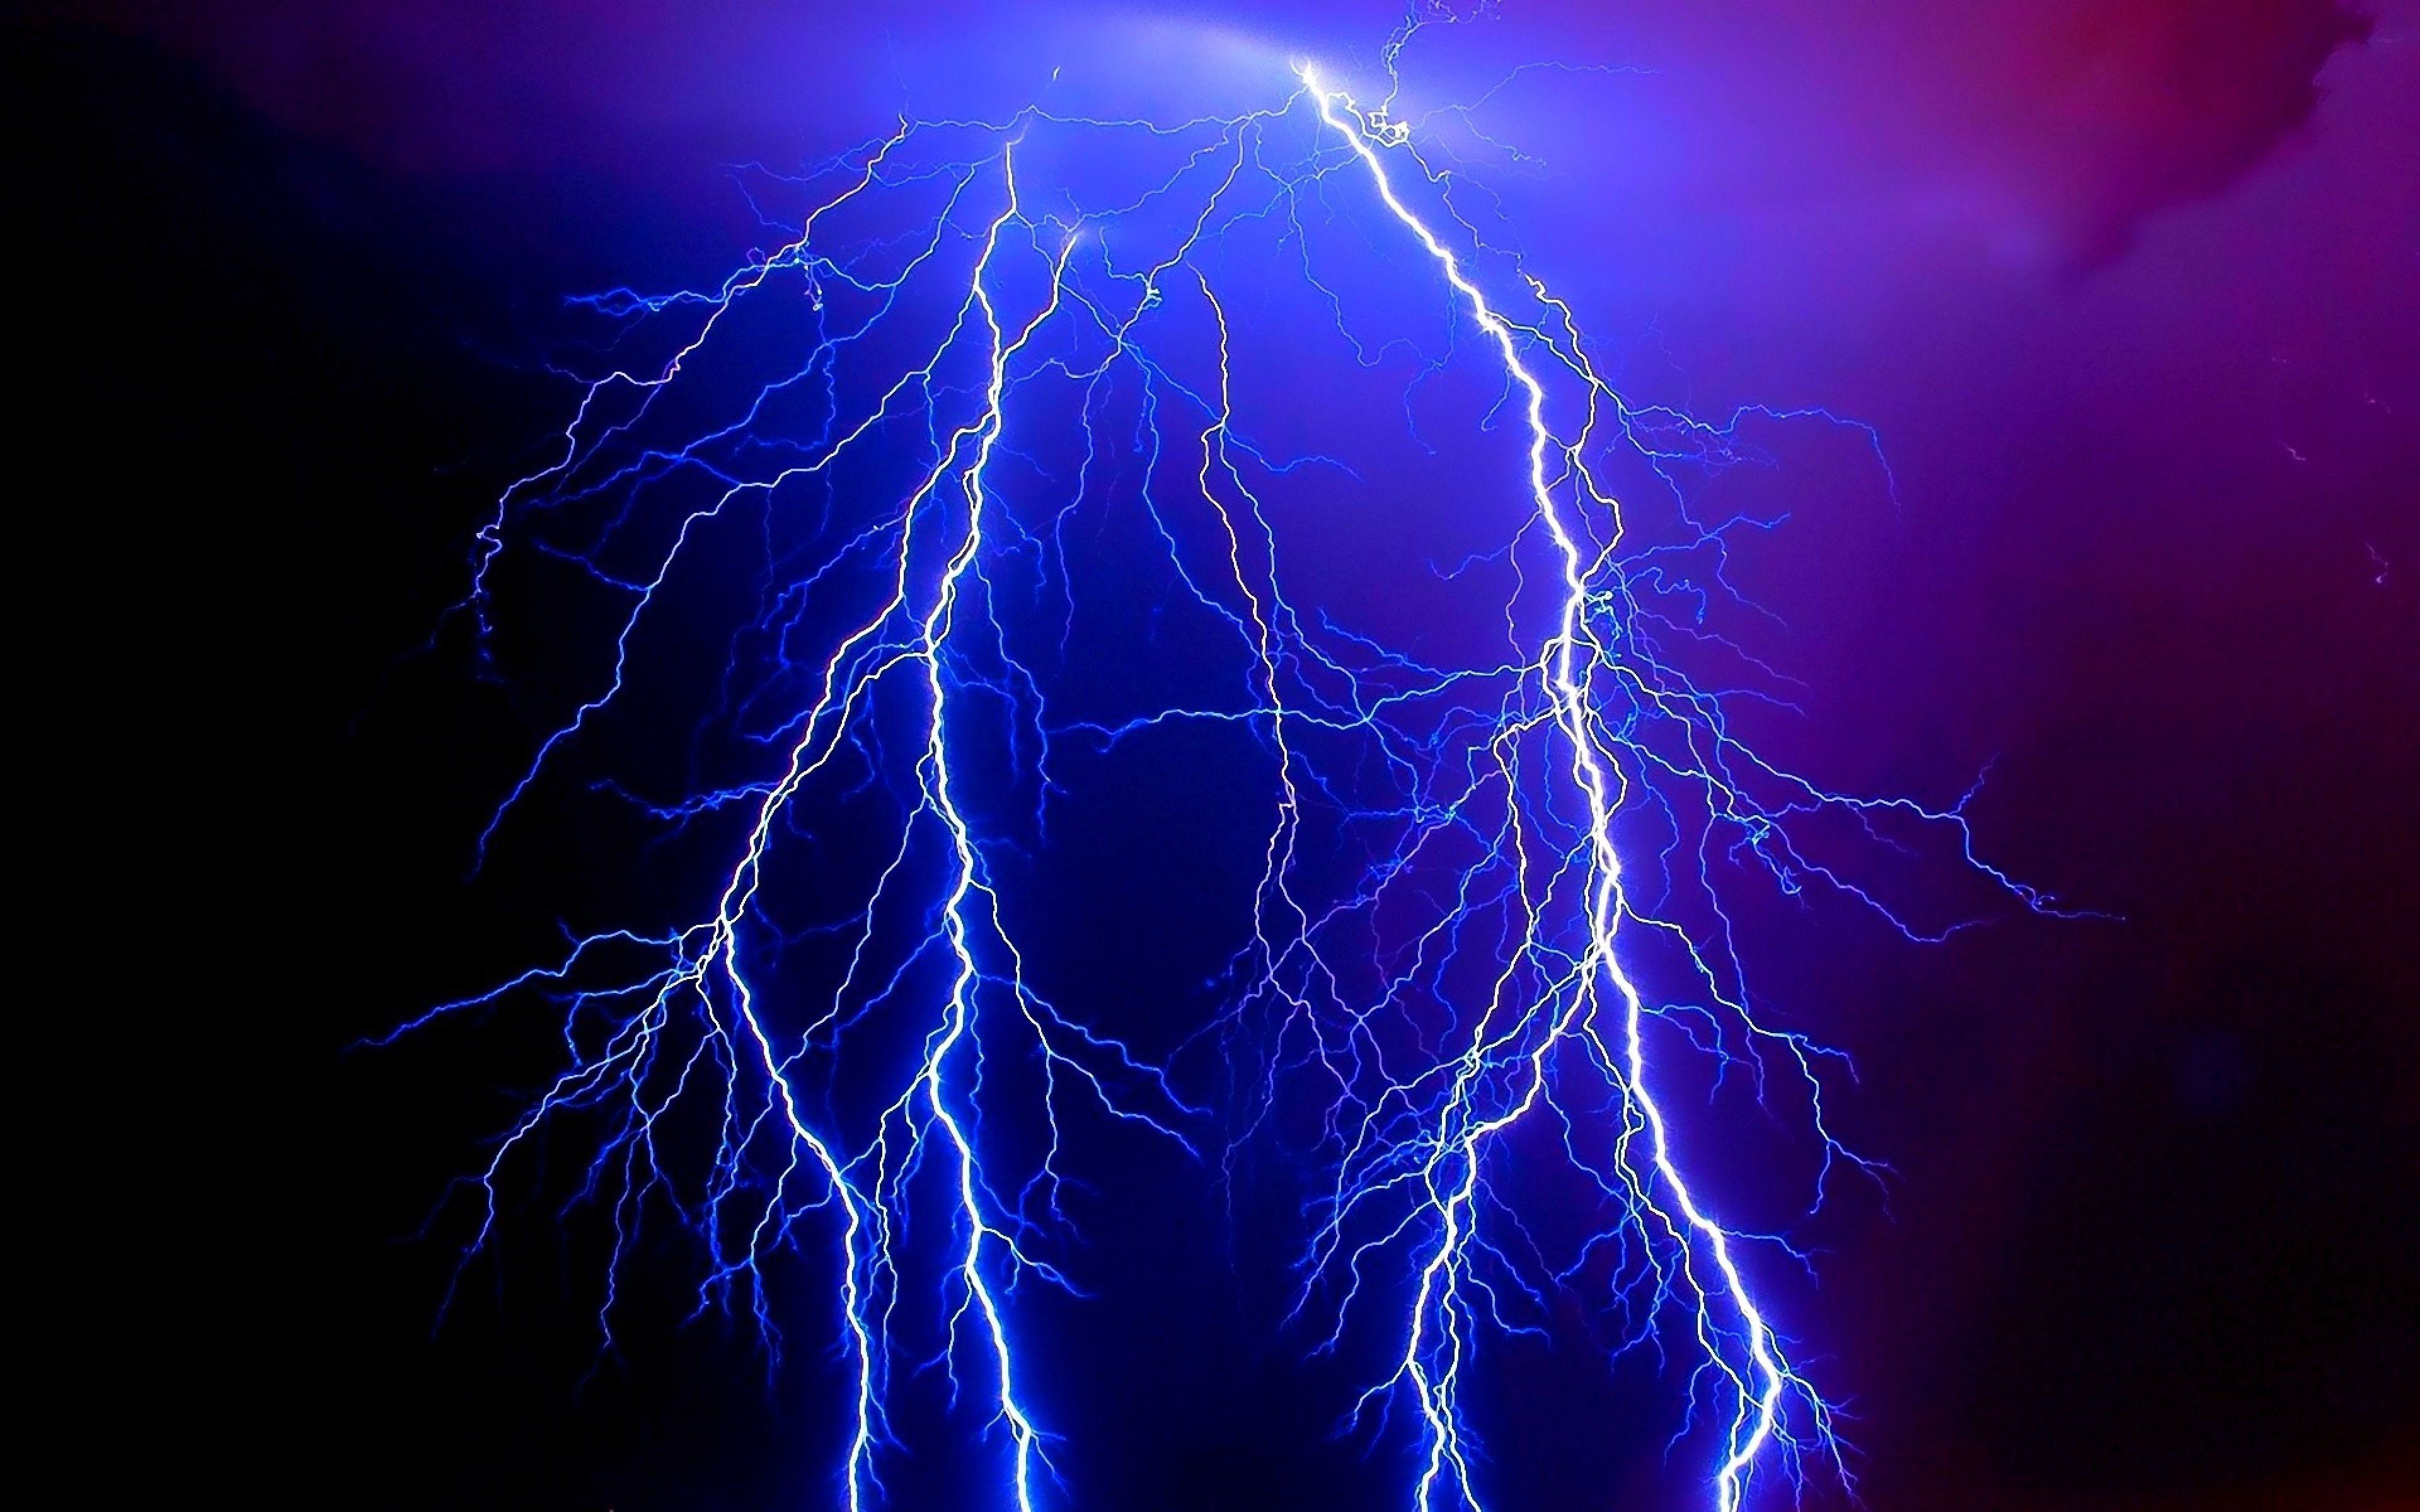 3840x2400 Wallpaper Lightning Electricity Category Elements Danger Night Lines Patterns Blue Lightning Beautiful Nature Lightning Strikes